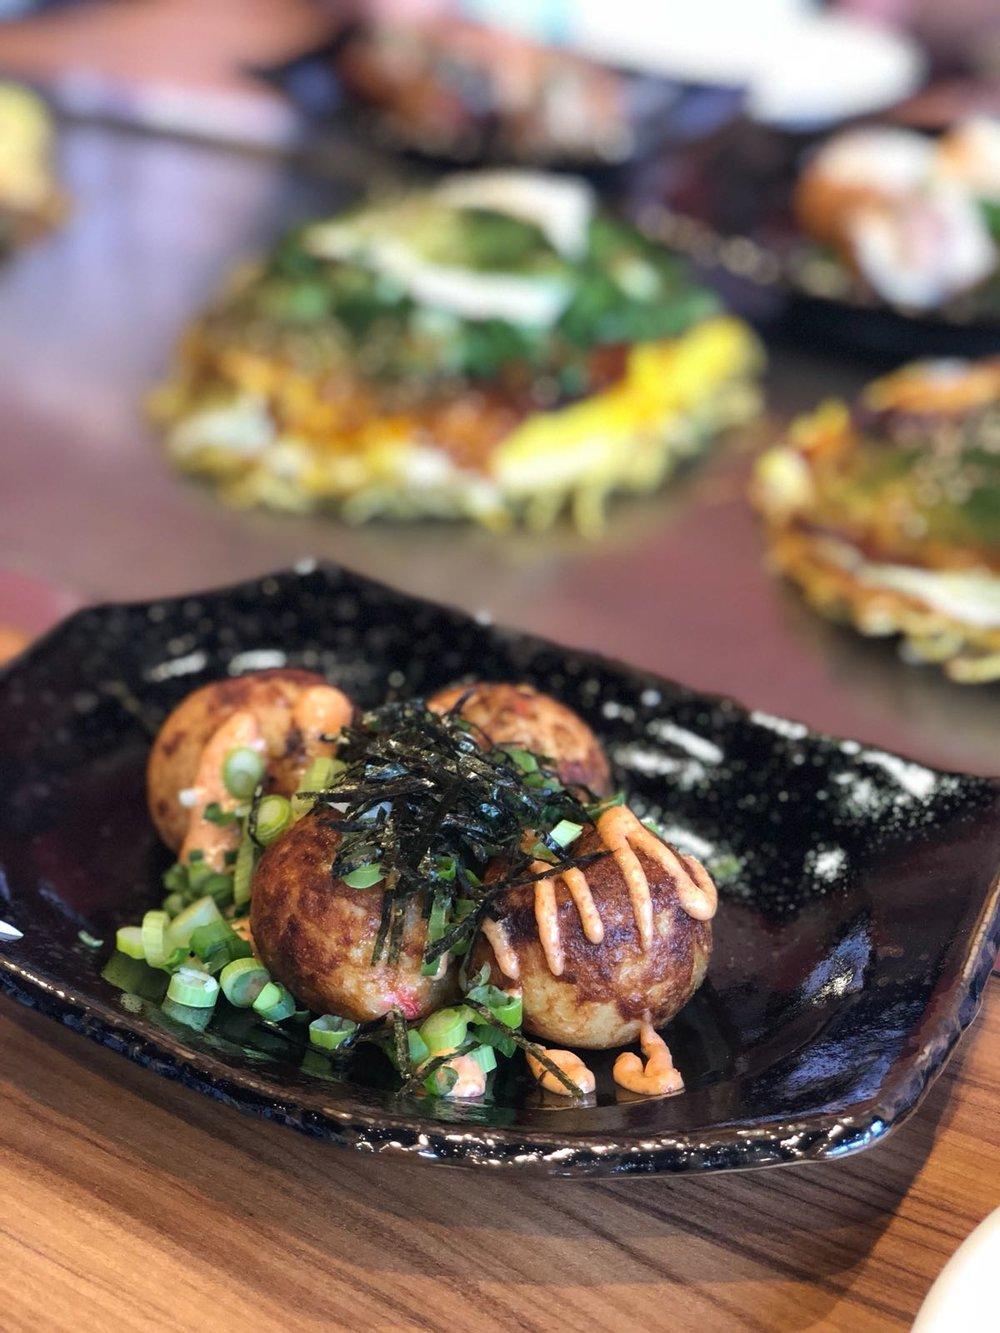 The original takoyaki from Takotaki Tanota.